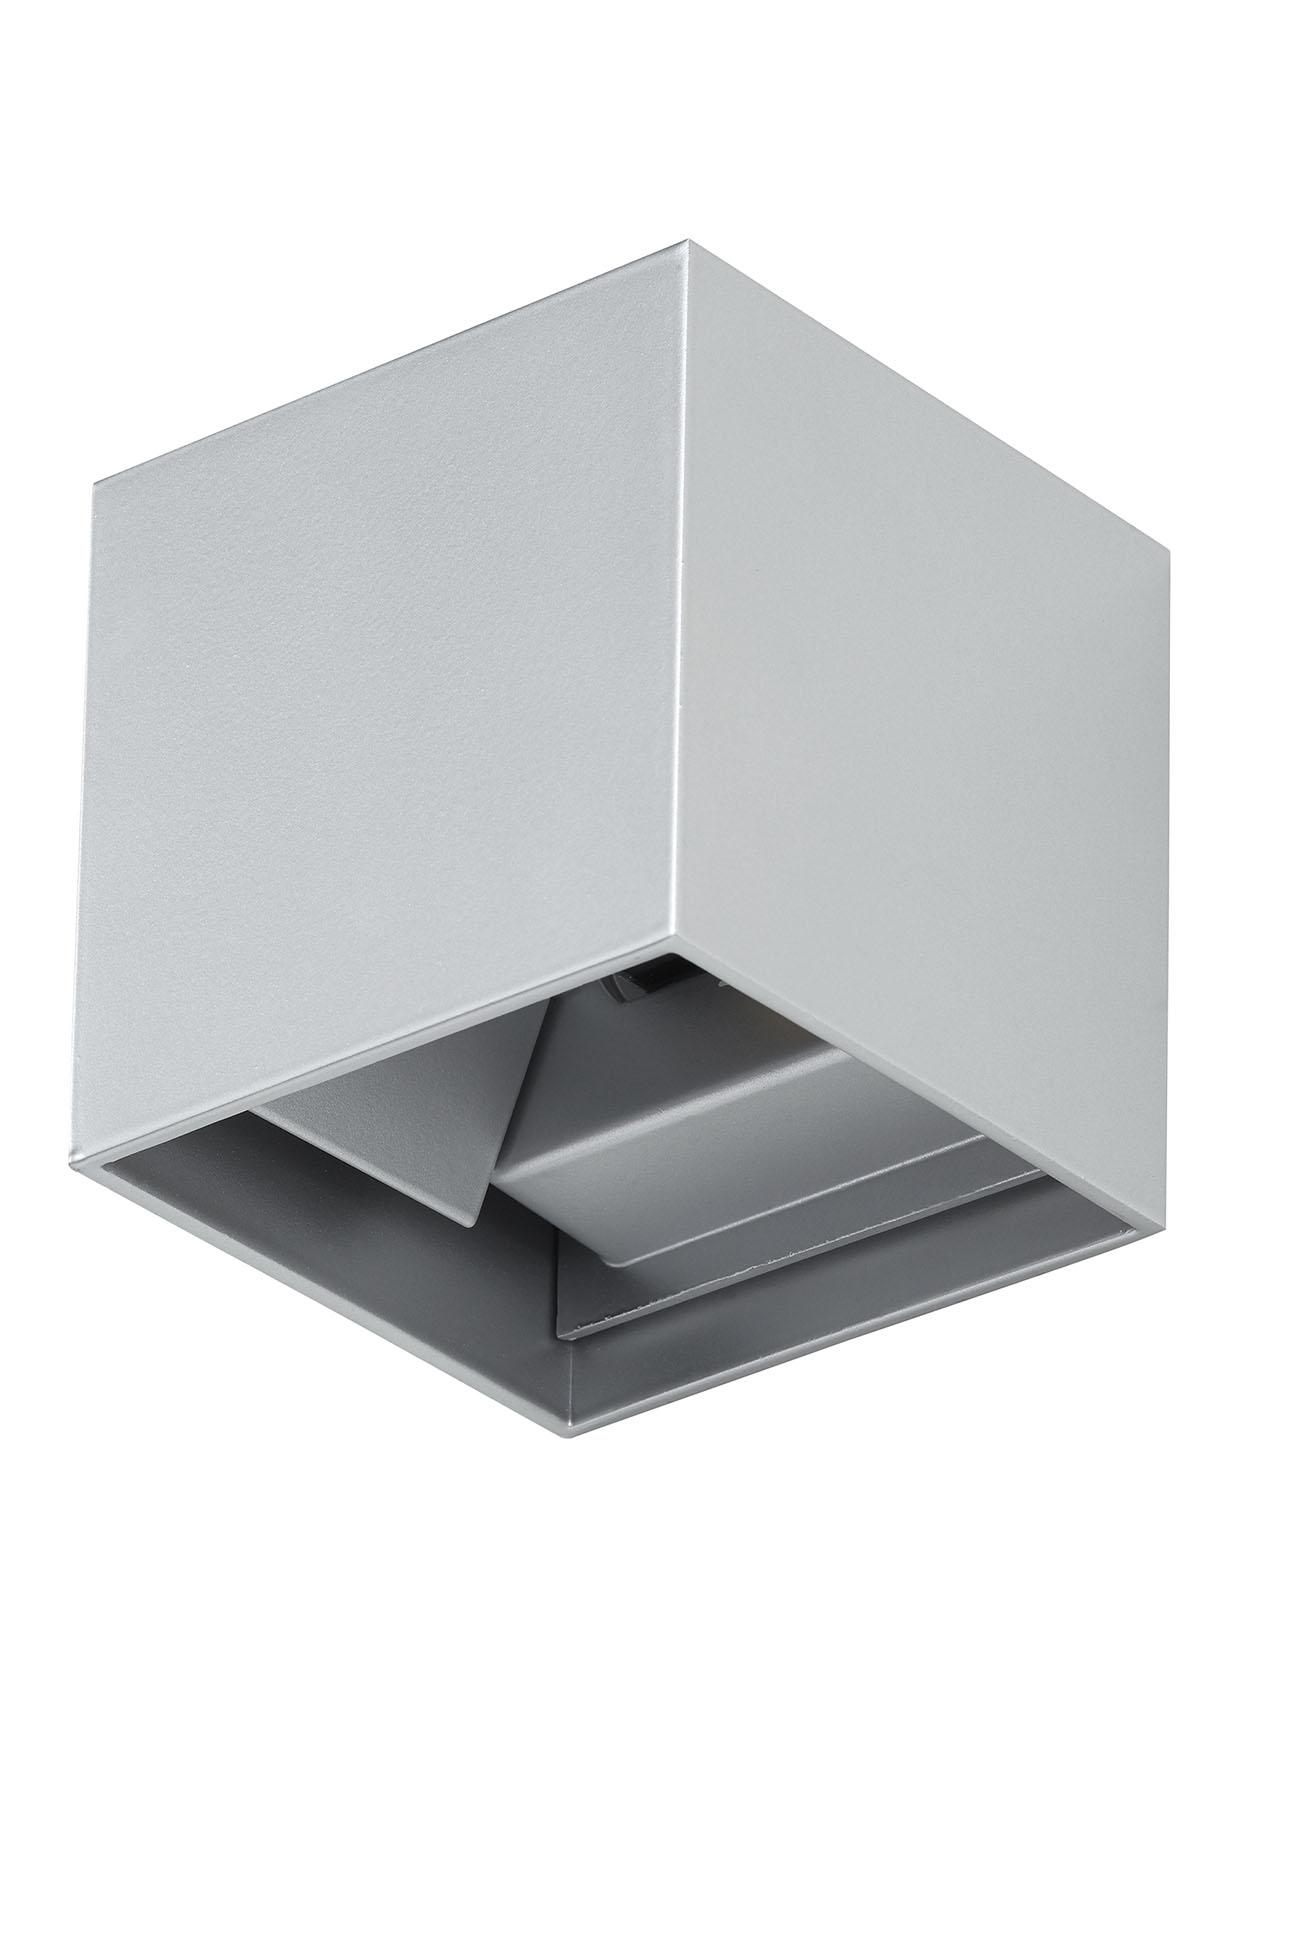 TELEFUNKEN LED Aussenwandleuchte, 11 cm, 7 W, Silber